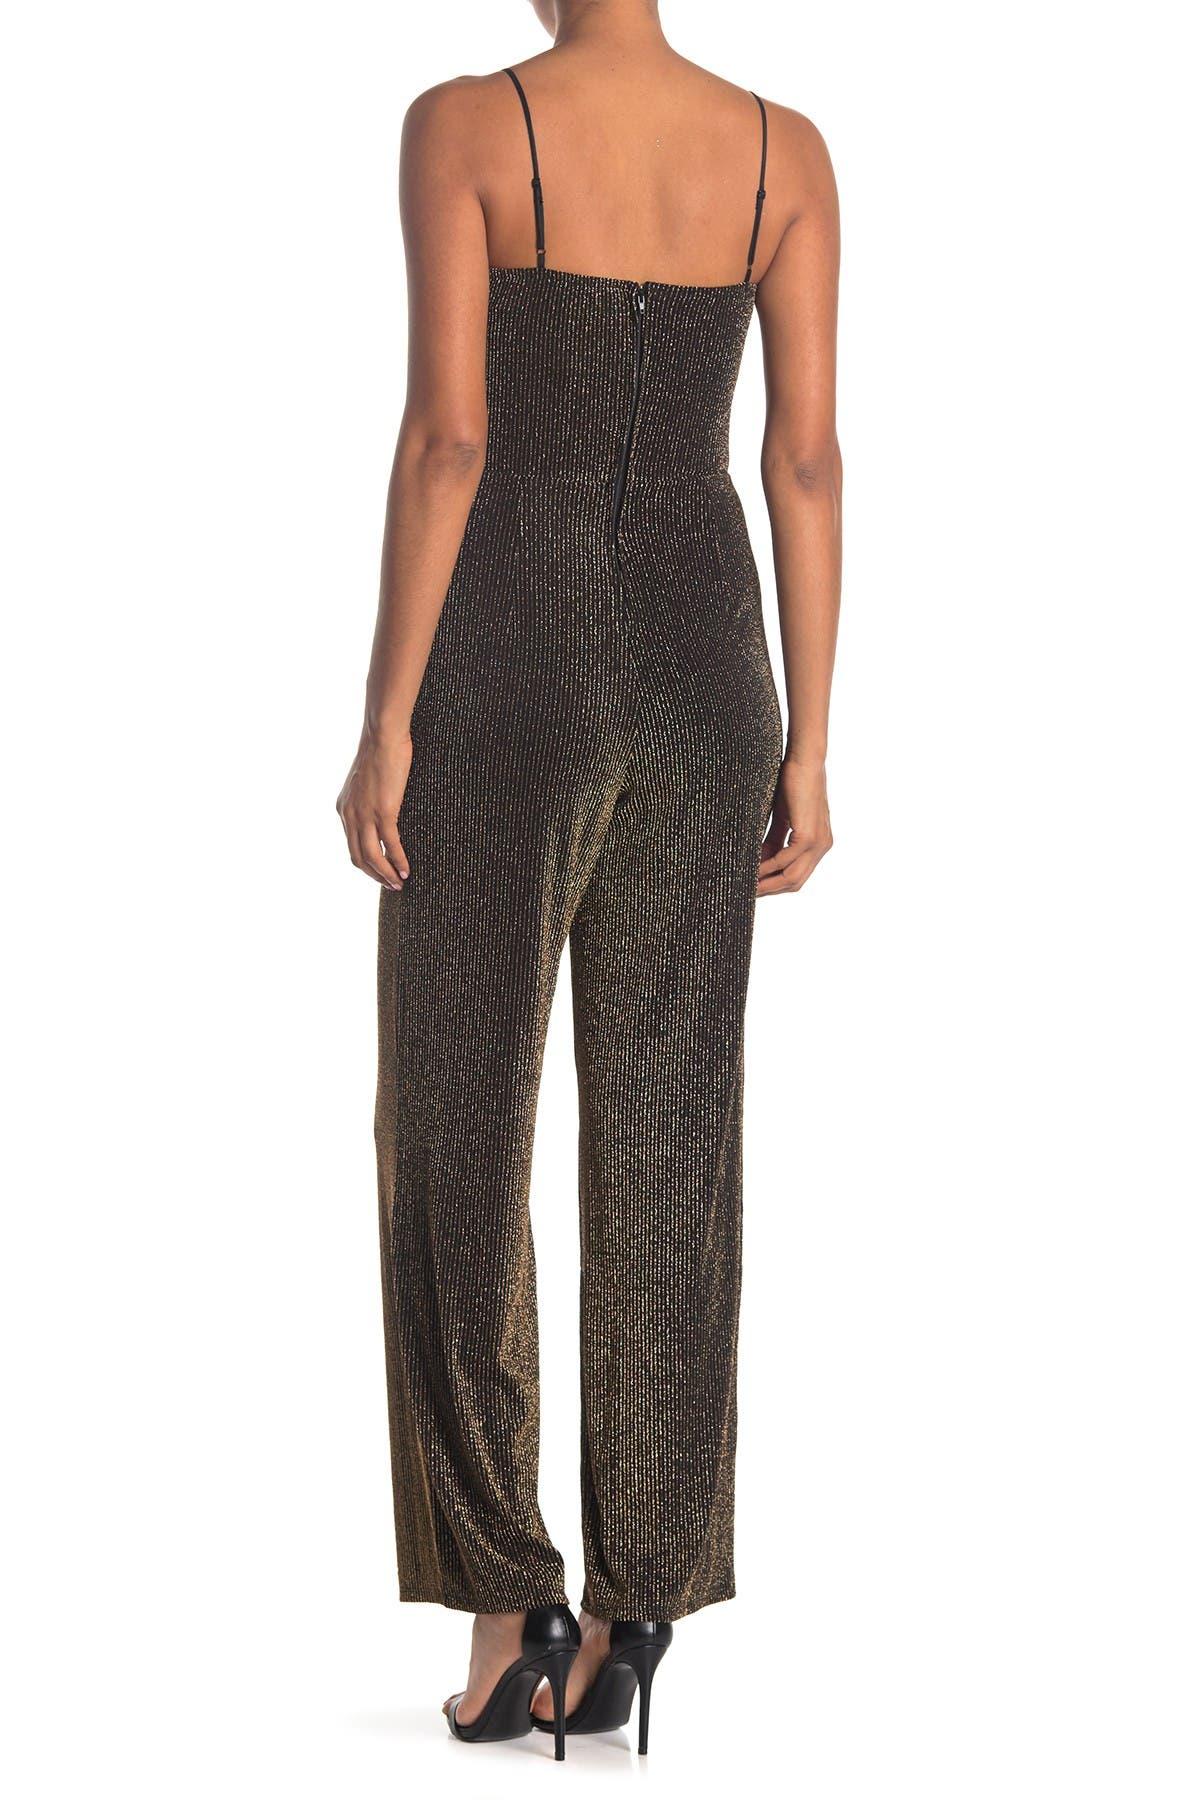 Image of ROW A Glitter Sleeveless Jumpsuit